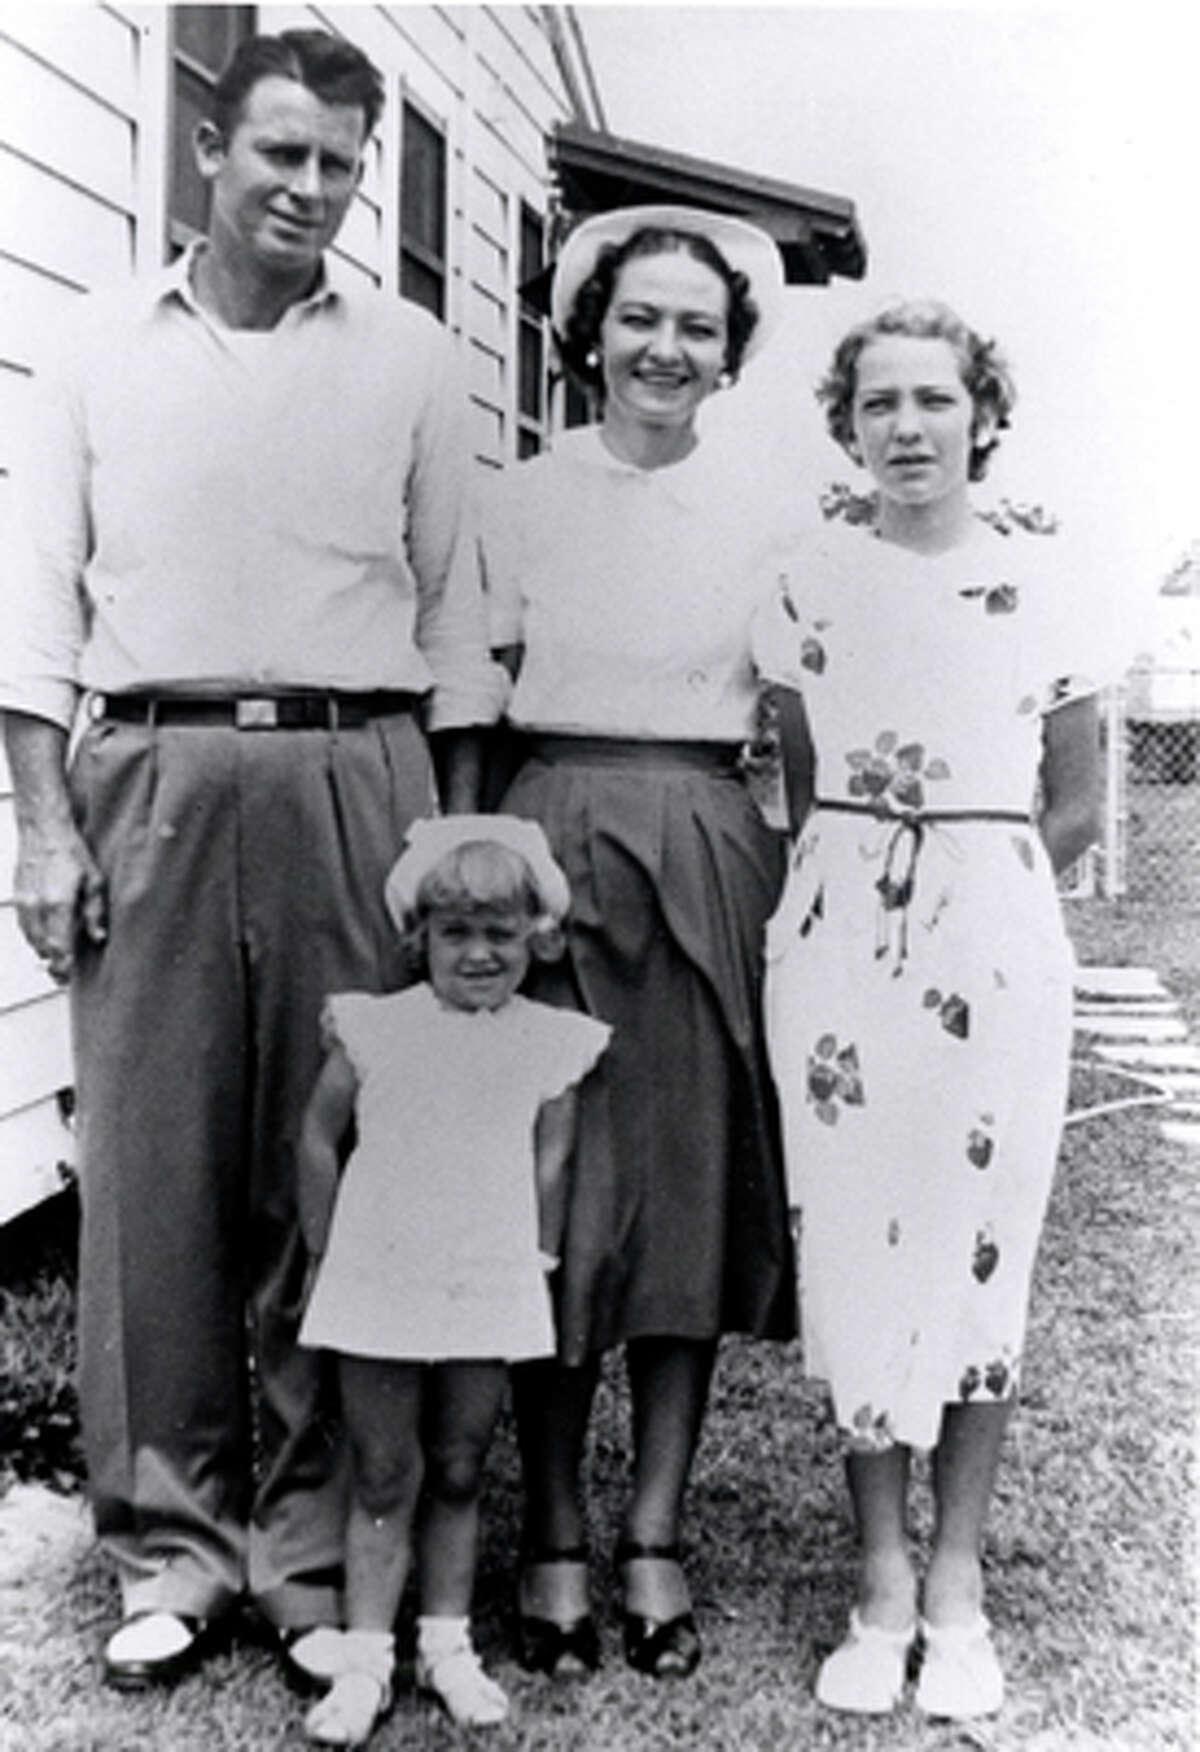 Farrah Fawcett - 3 yrs old with Dad (James Fawcett), Mom (Pauline Fawcett) and sister (Diane Fawcett)